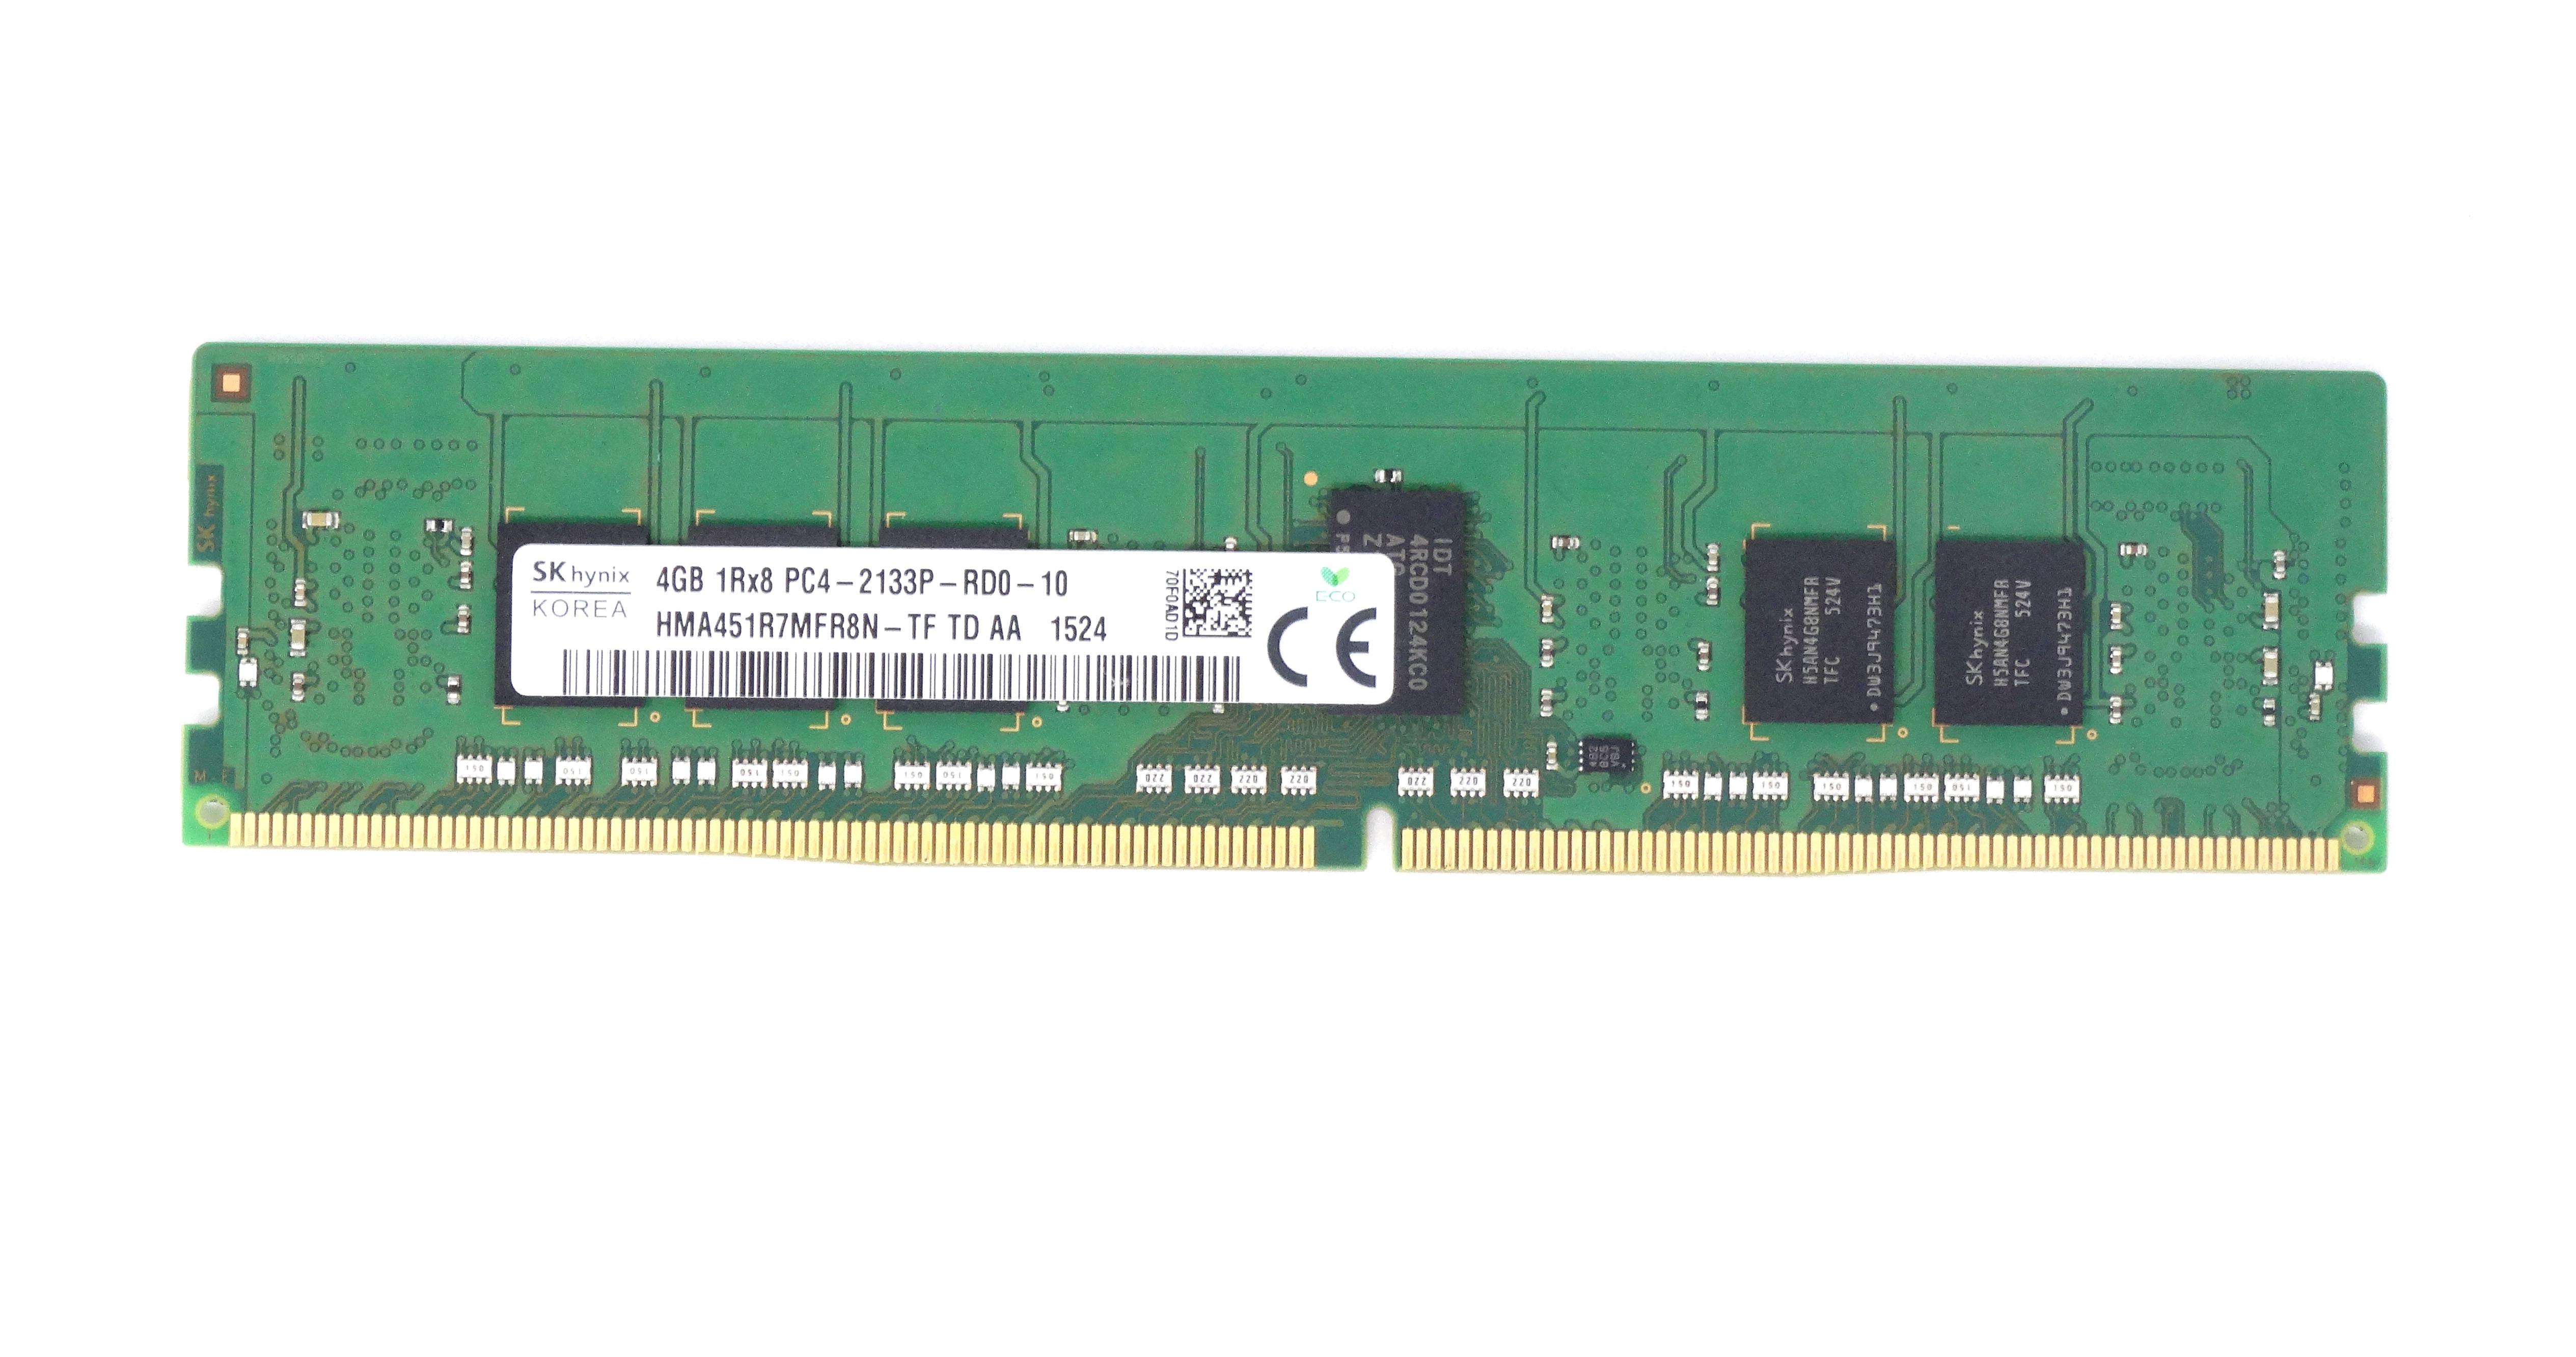 Hynix 4GB 1Rx8 Pc4-2133P DDR4 ECC REG Memory (HMA451R7MFR8N-TF)